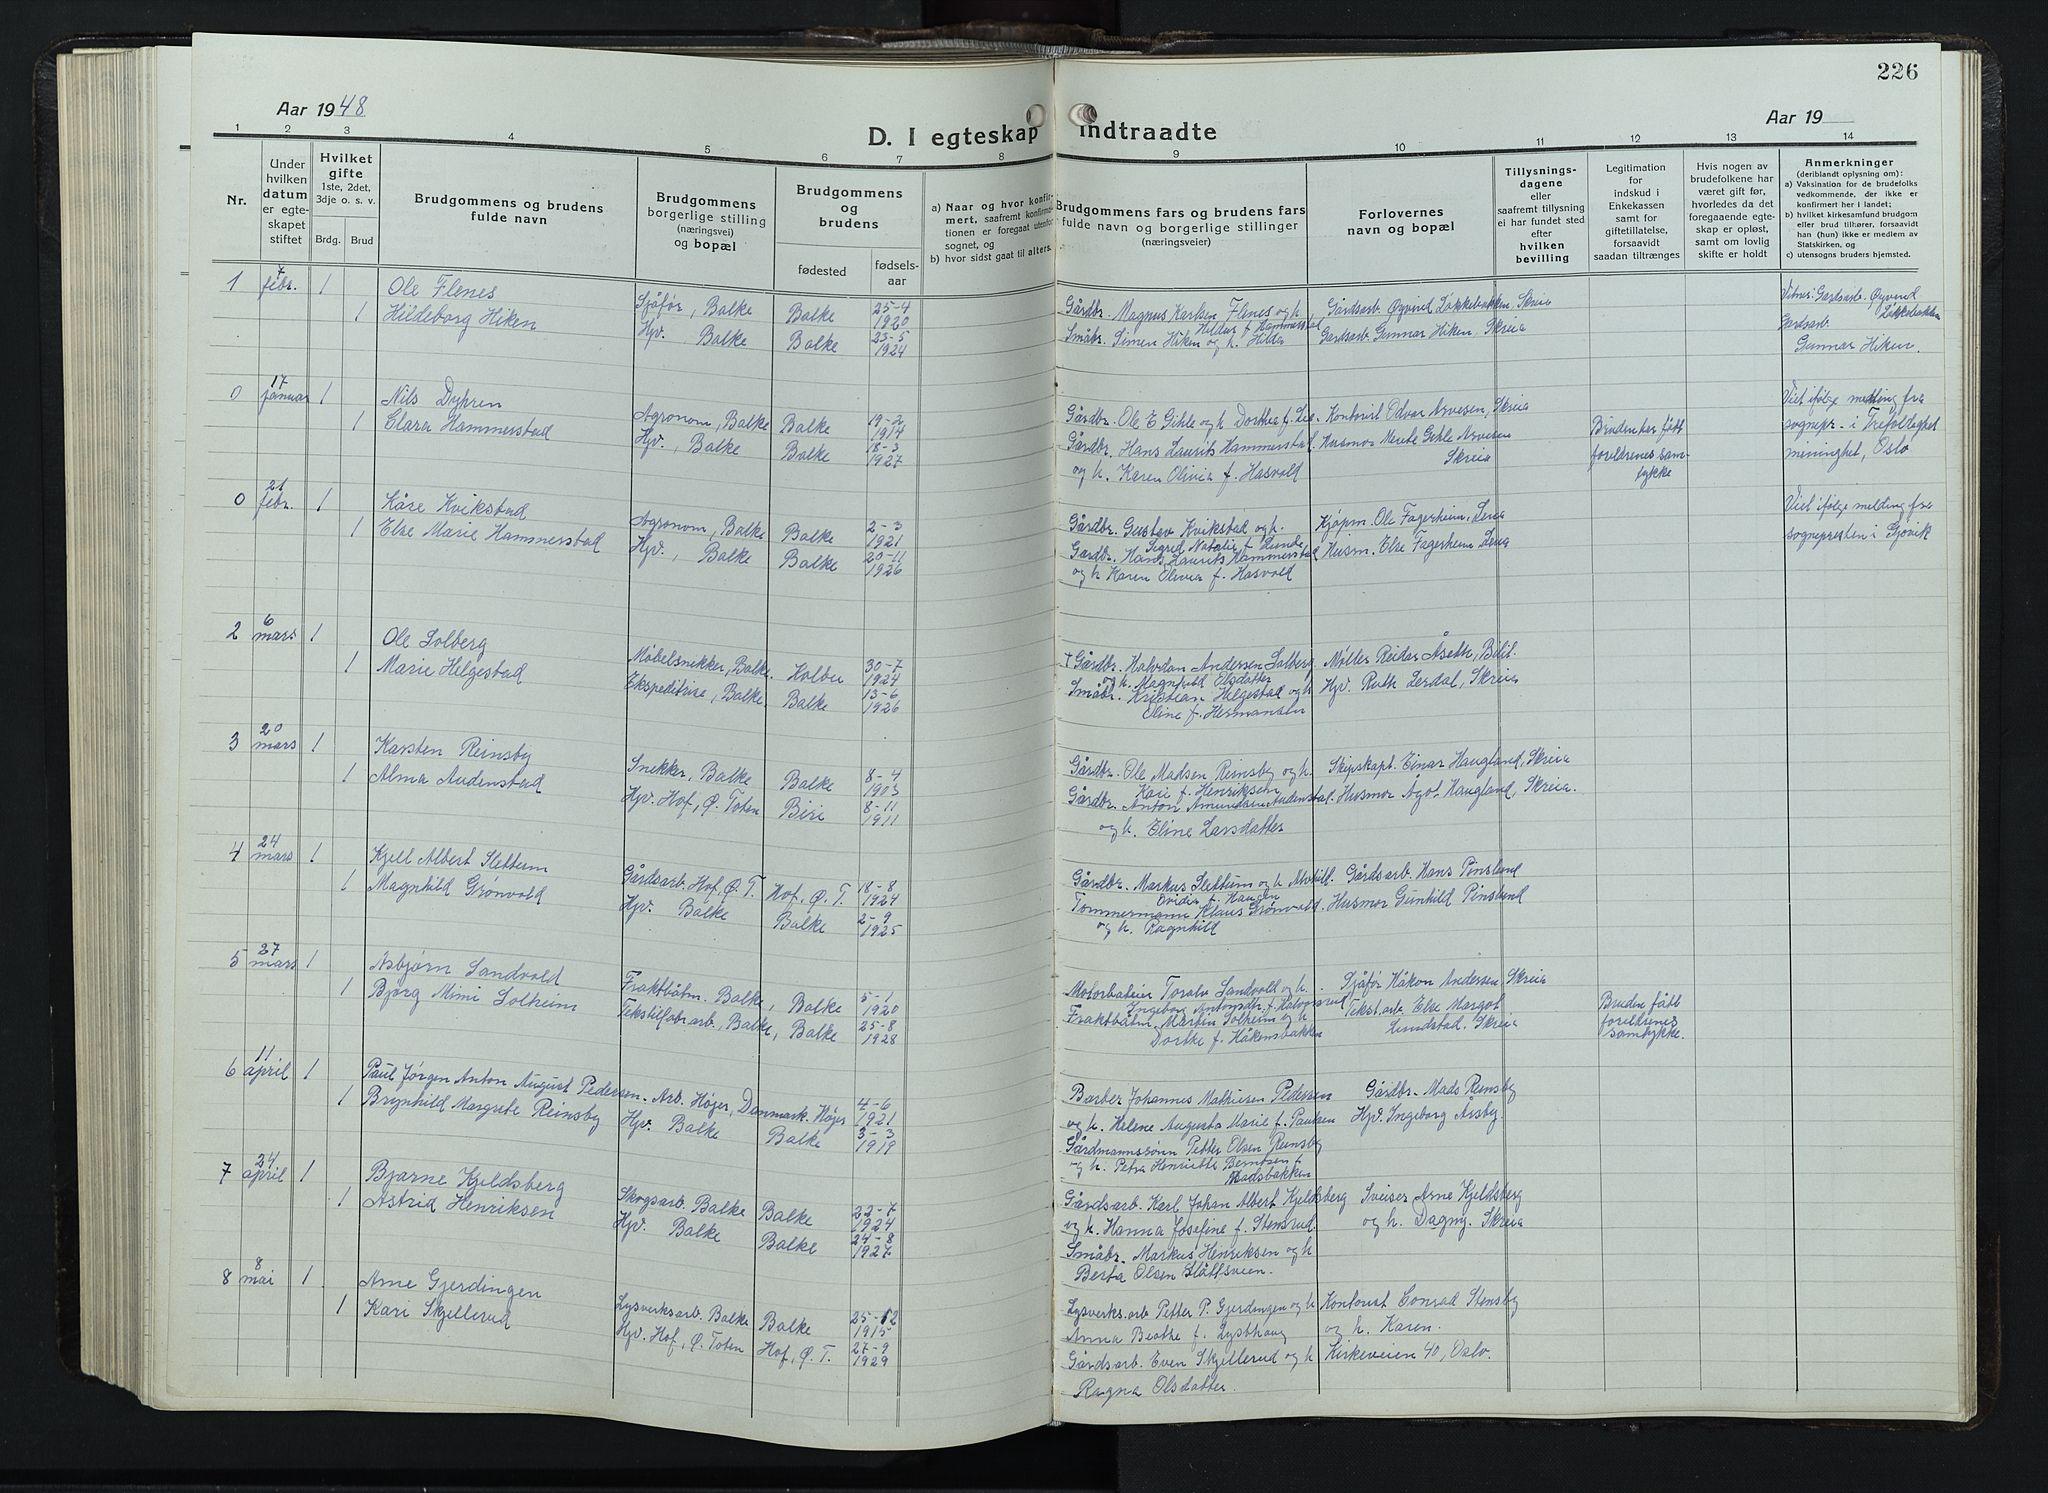 SAH, Balke prestekontor, Klokkerbok nr. 1, 1920-1955, s. 226